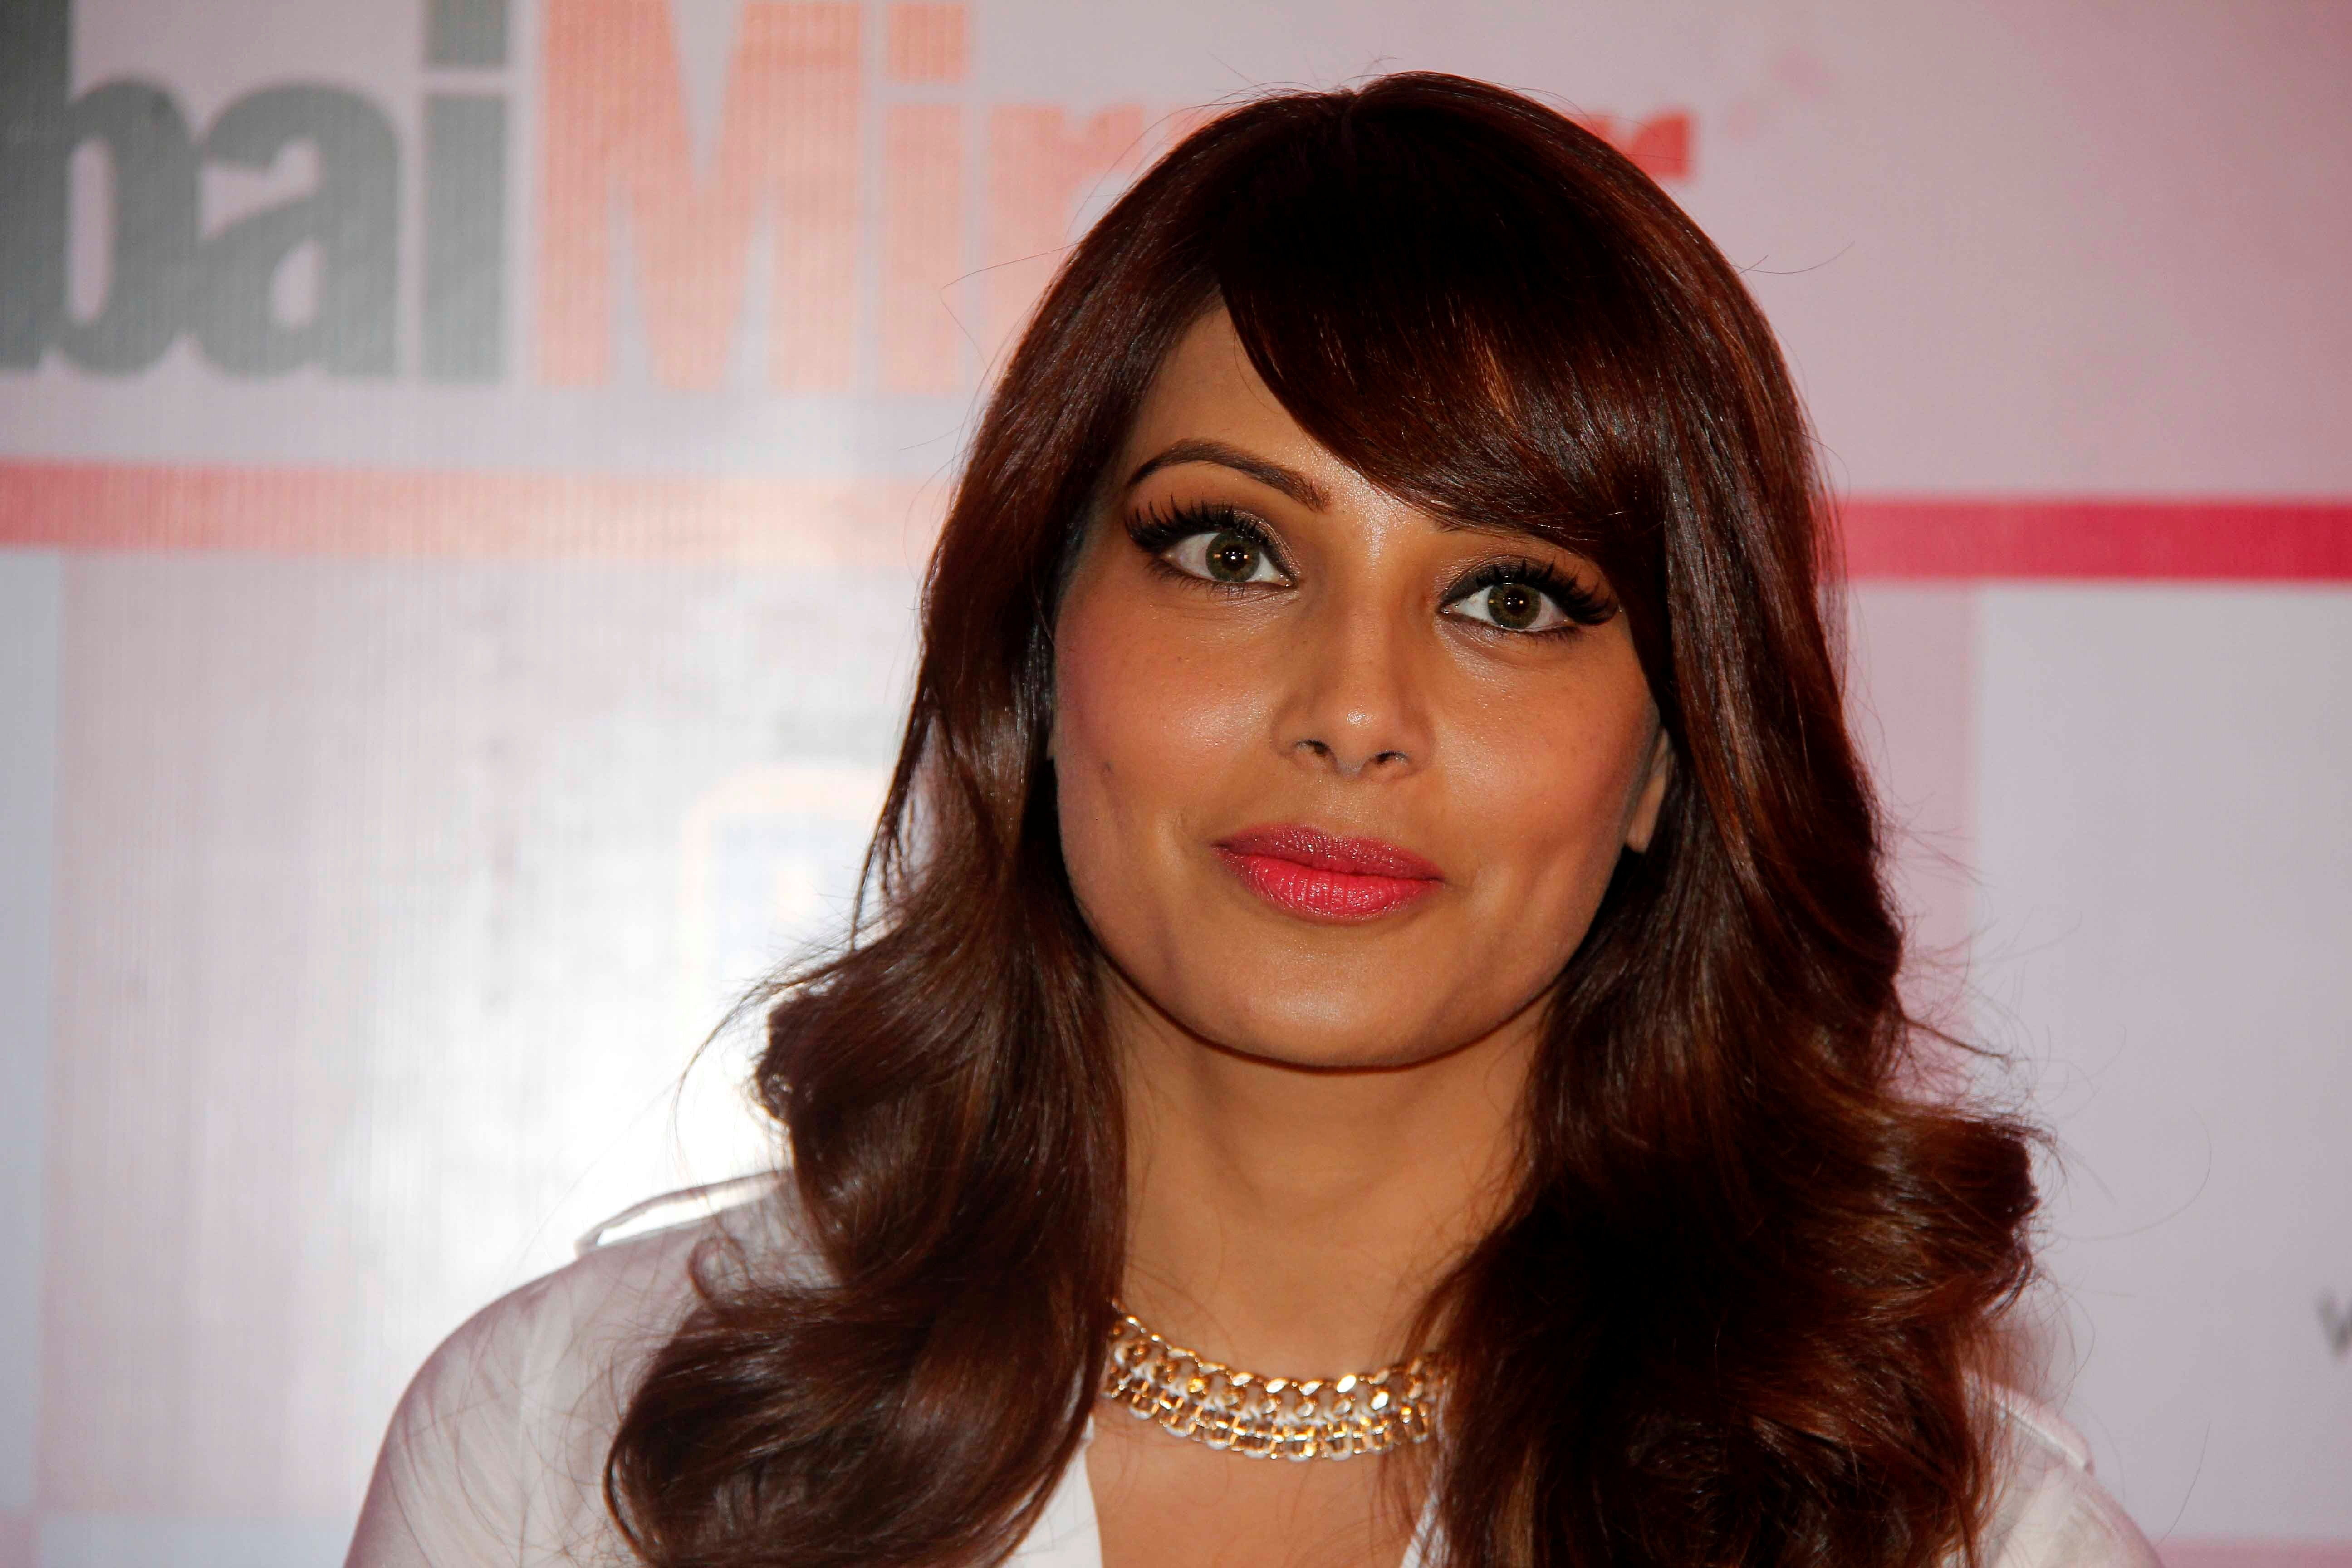 Lovely Red Lips Of Bollywood Actress Bipasha Basu Hd Wallpapers Hd